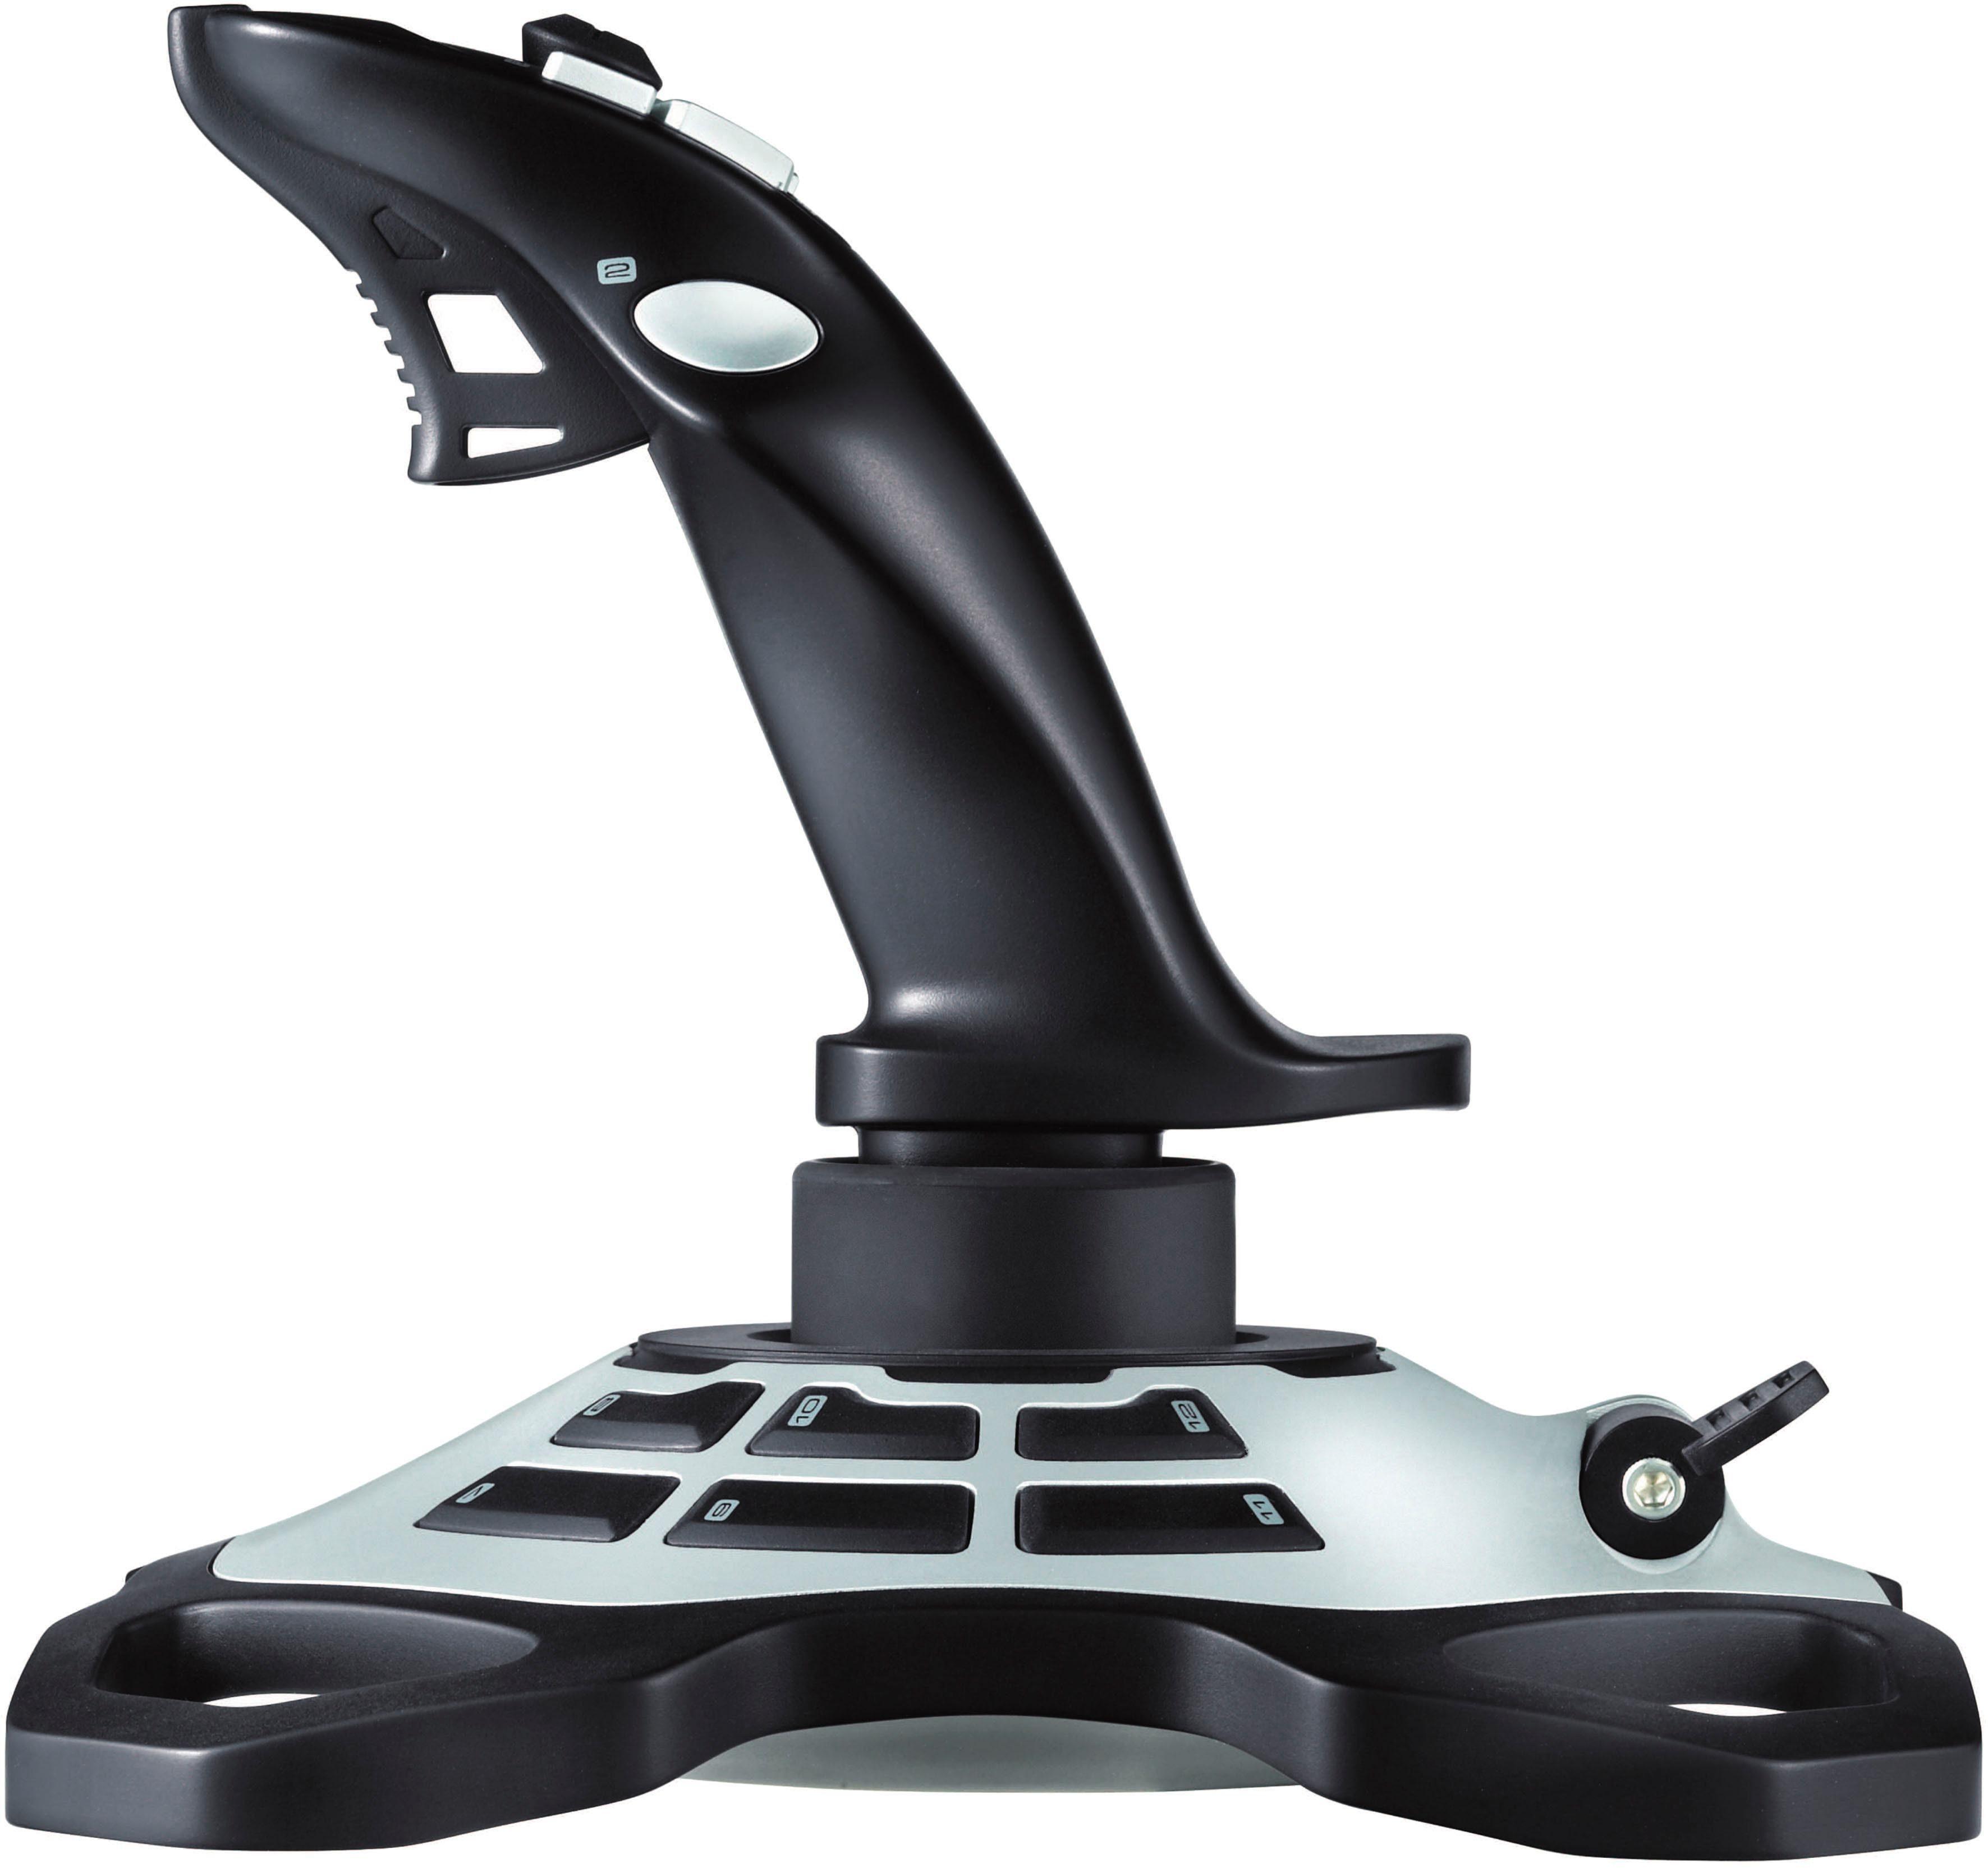 Logitech Games »Extreme 3D Pro Precision Flight Stick - G-Series« Controller